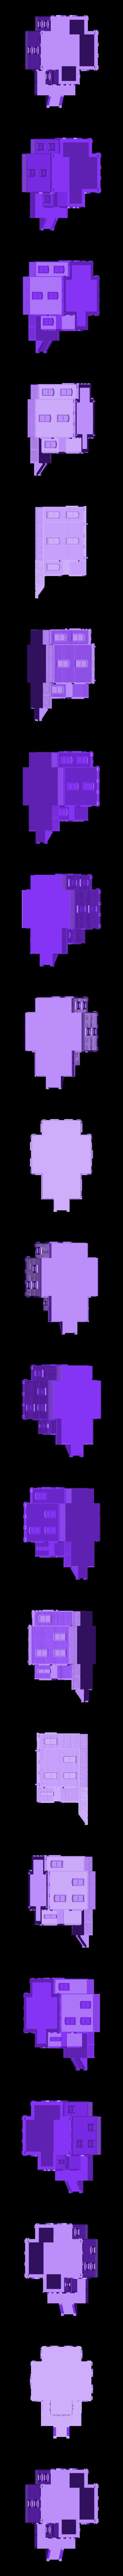 house.stl Download STL file bates motel house psycho house • 3D printable object, PatricioVazquez